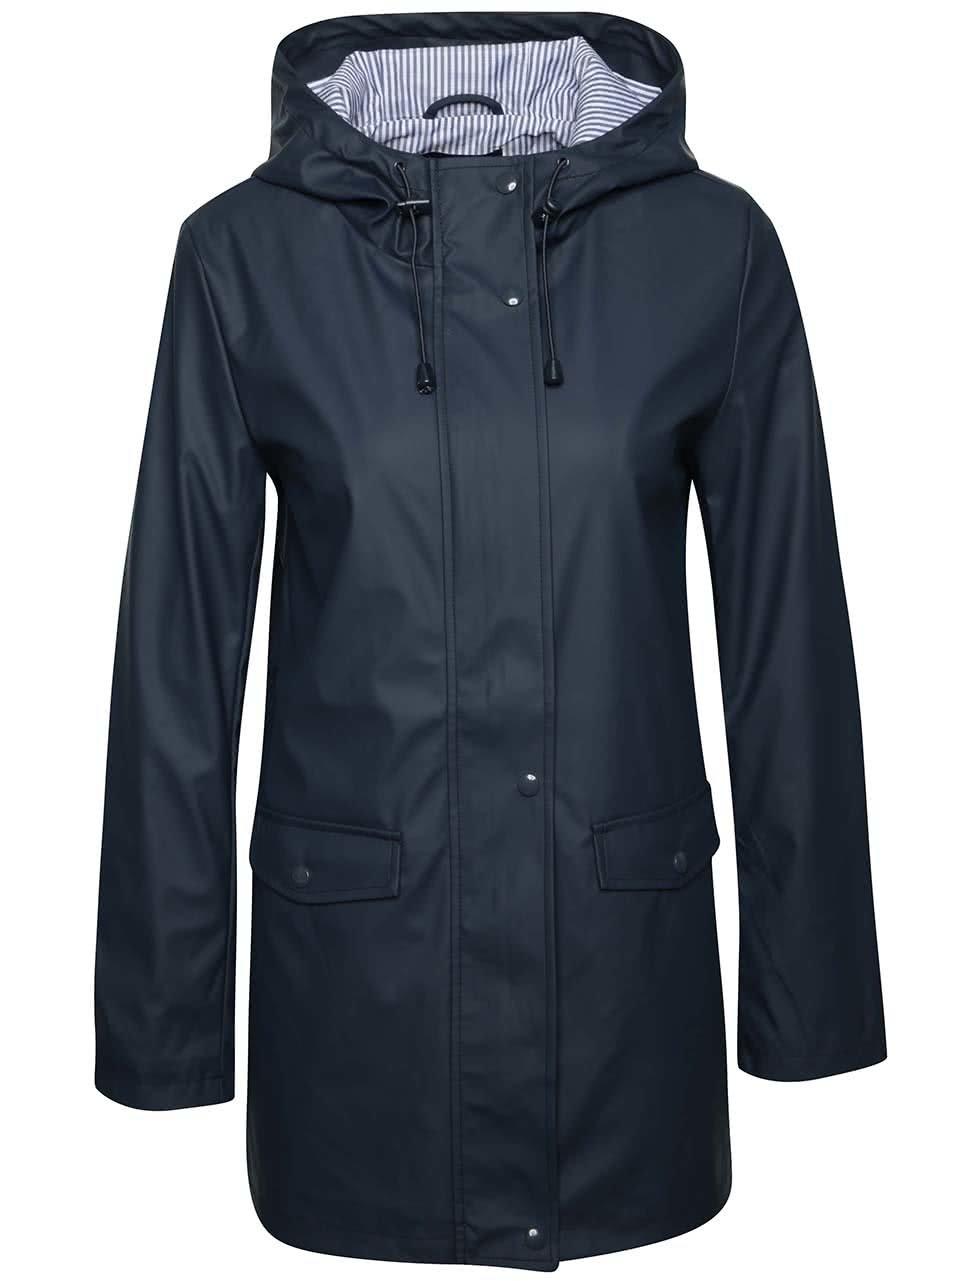 Šedomodrý kabát s kapucí Dorothy Perkins